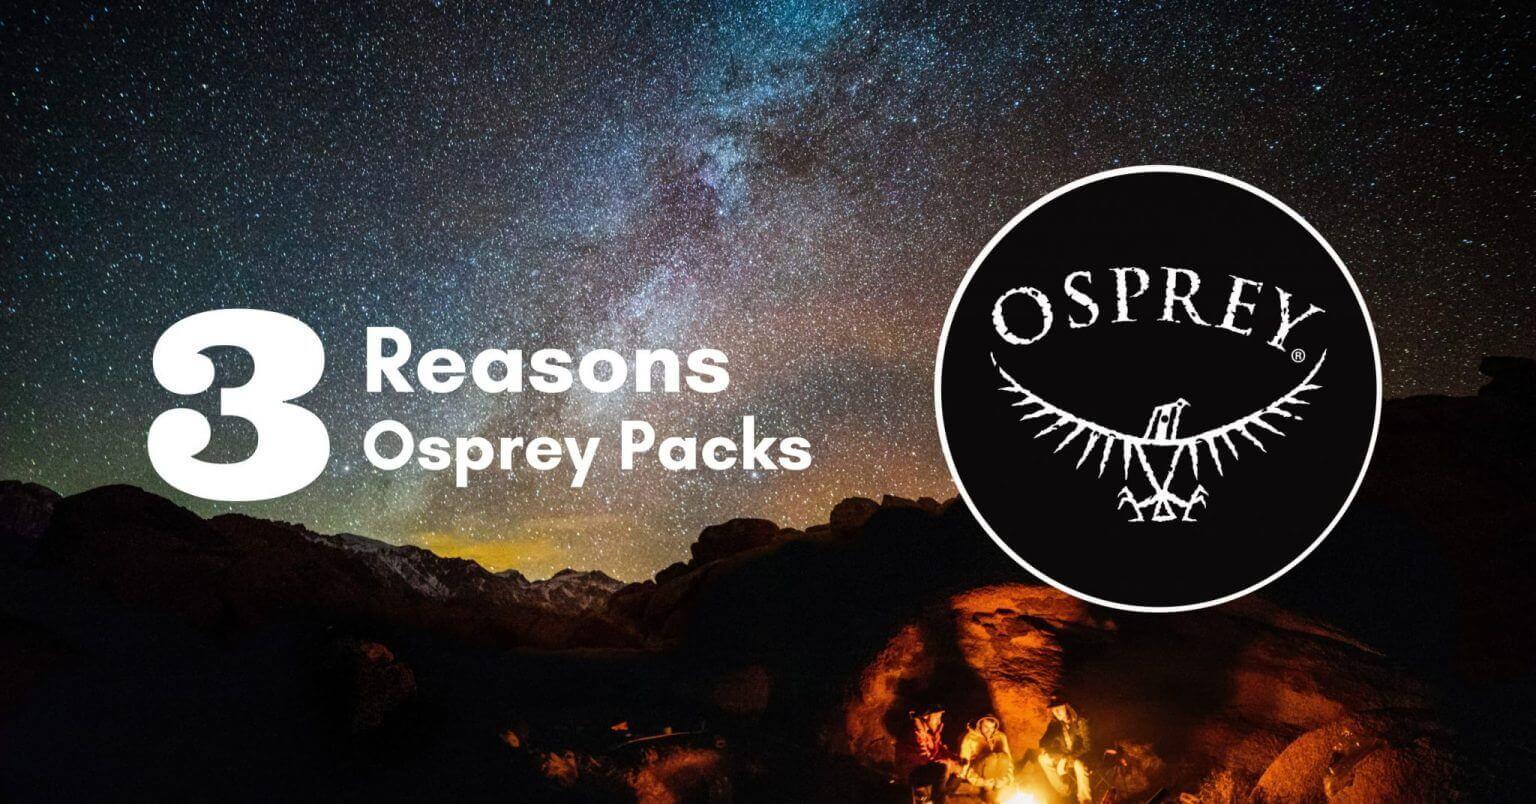 osprey-backpack-malaysia-top-3-reason-osprey